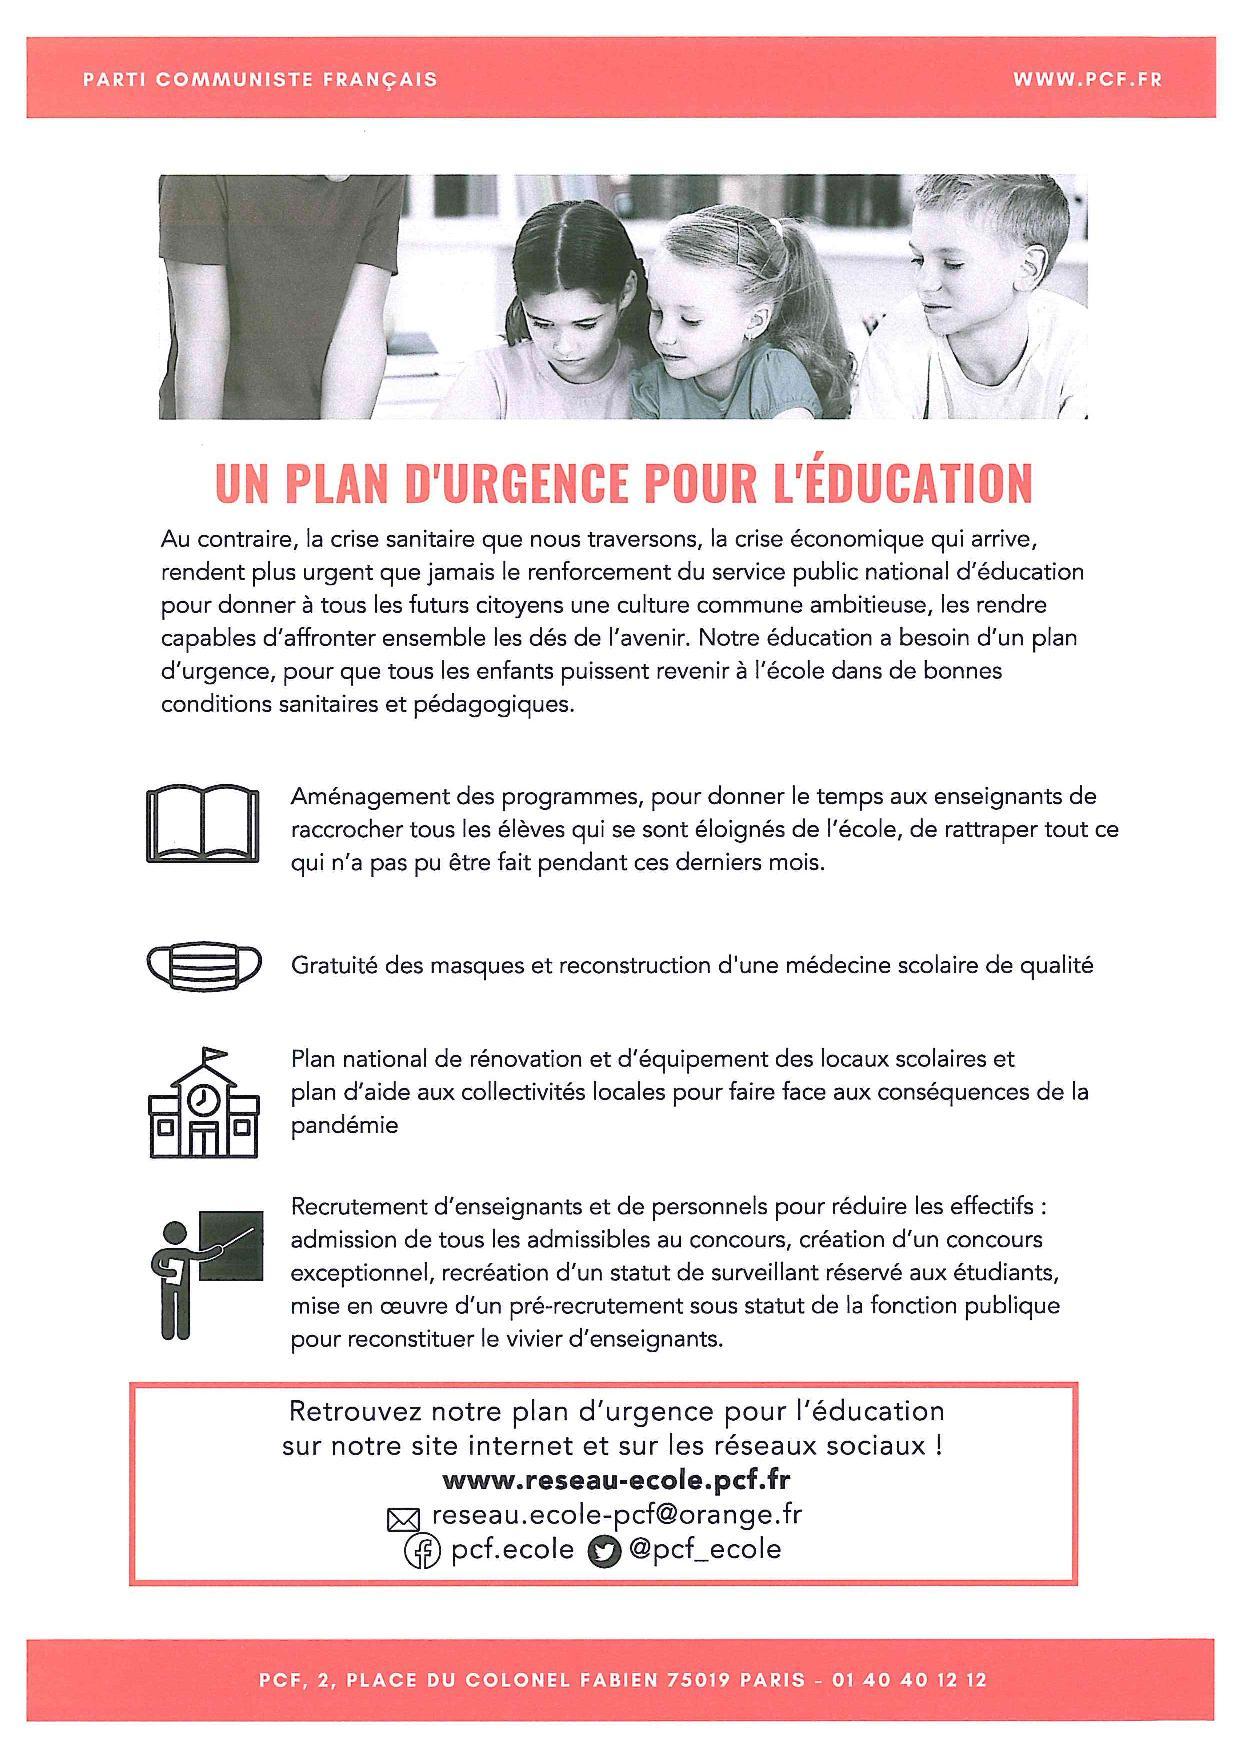 education-page-001.jpg